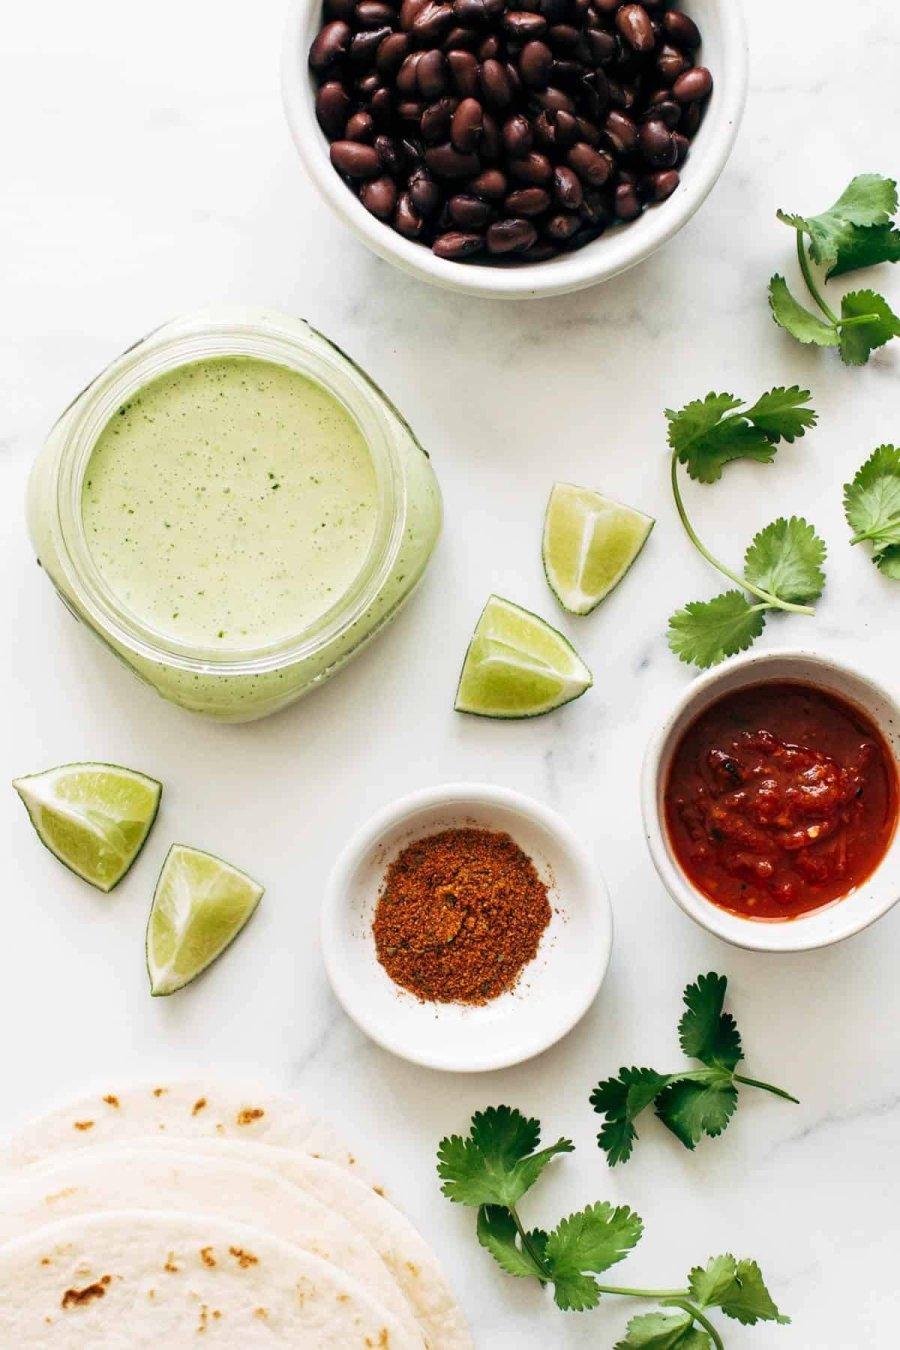 Ingredients for Crispy Black Bean Tacos